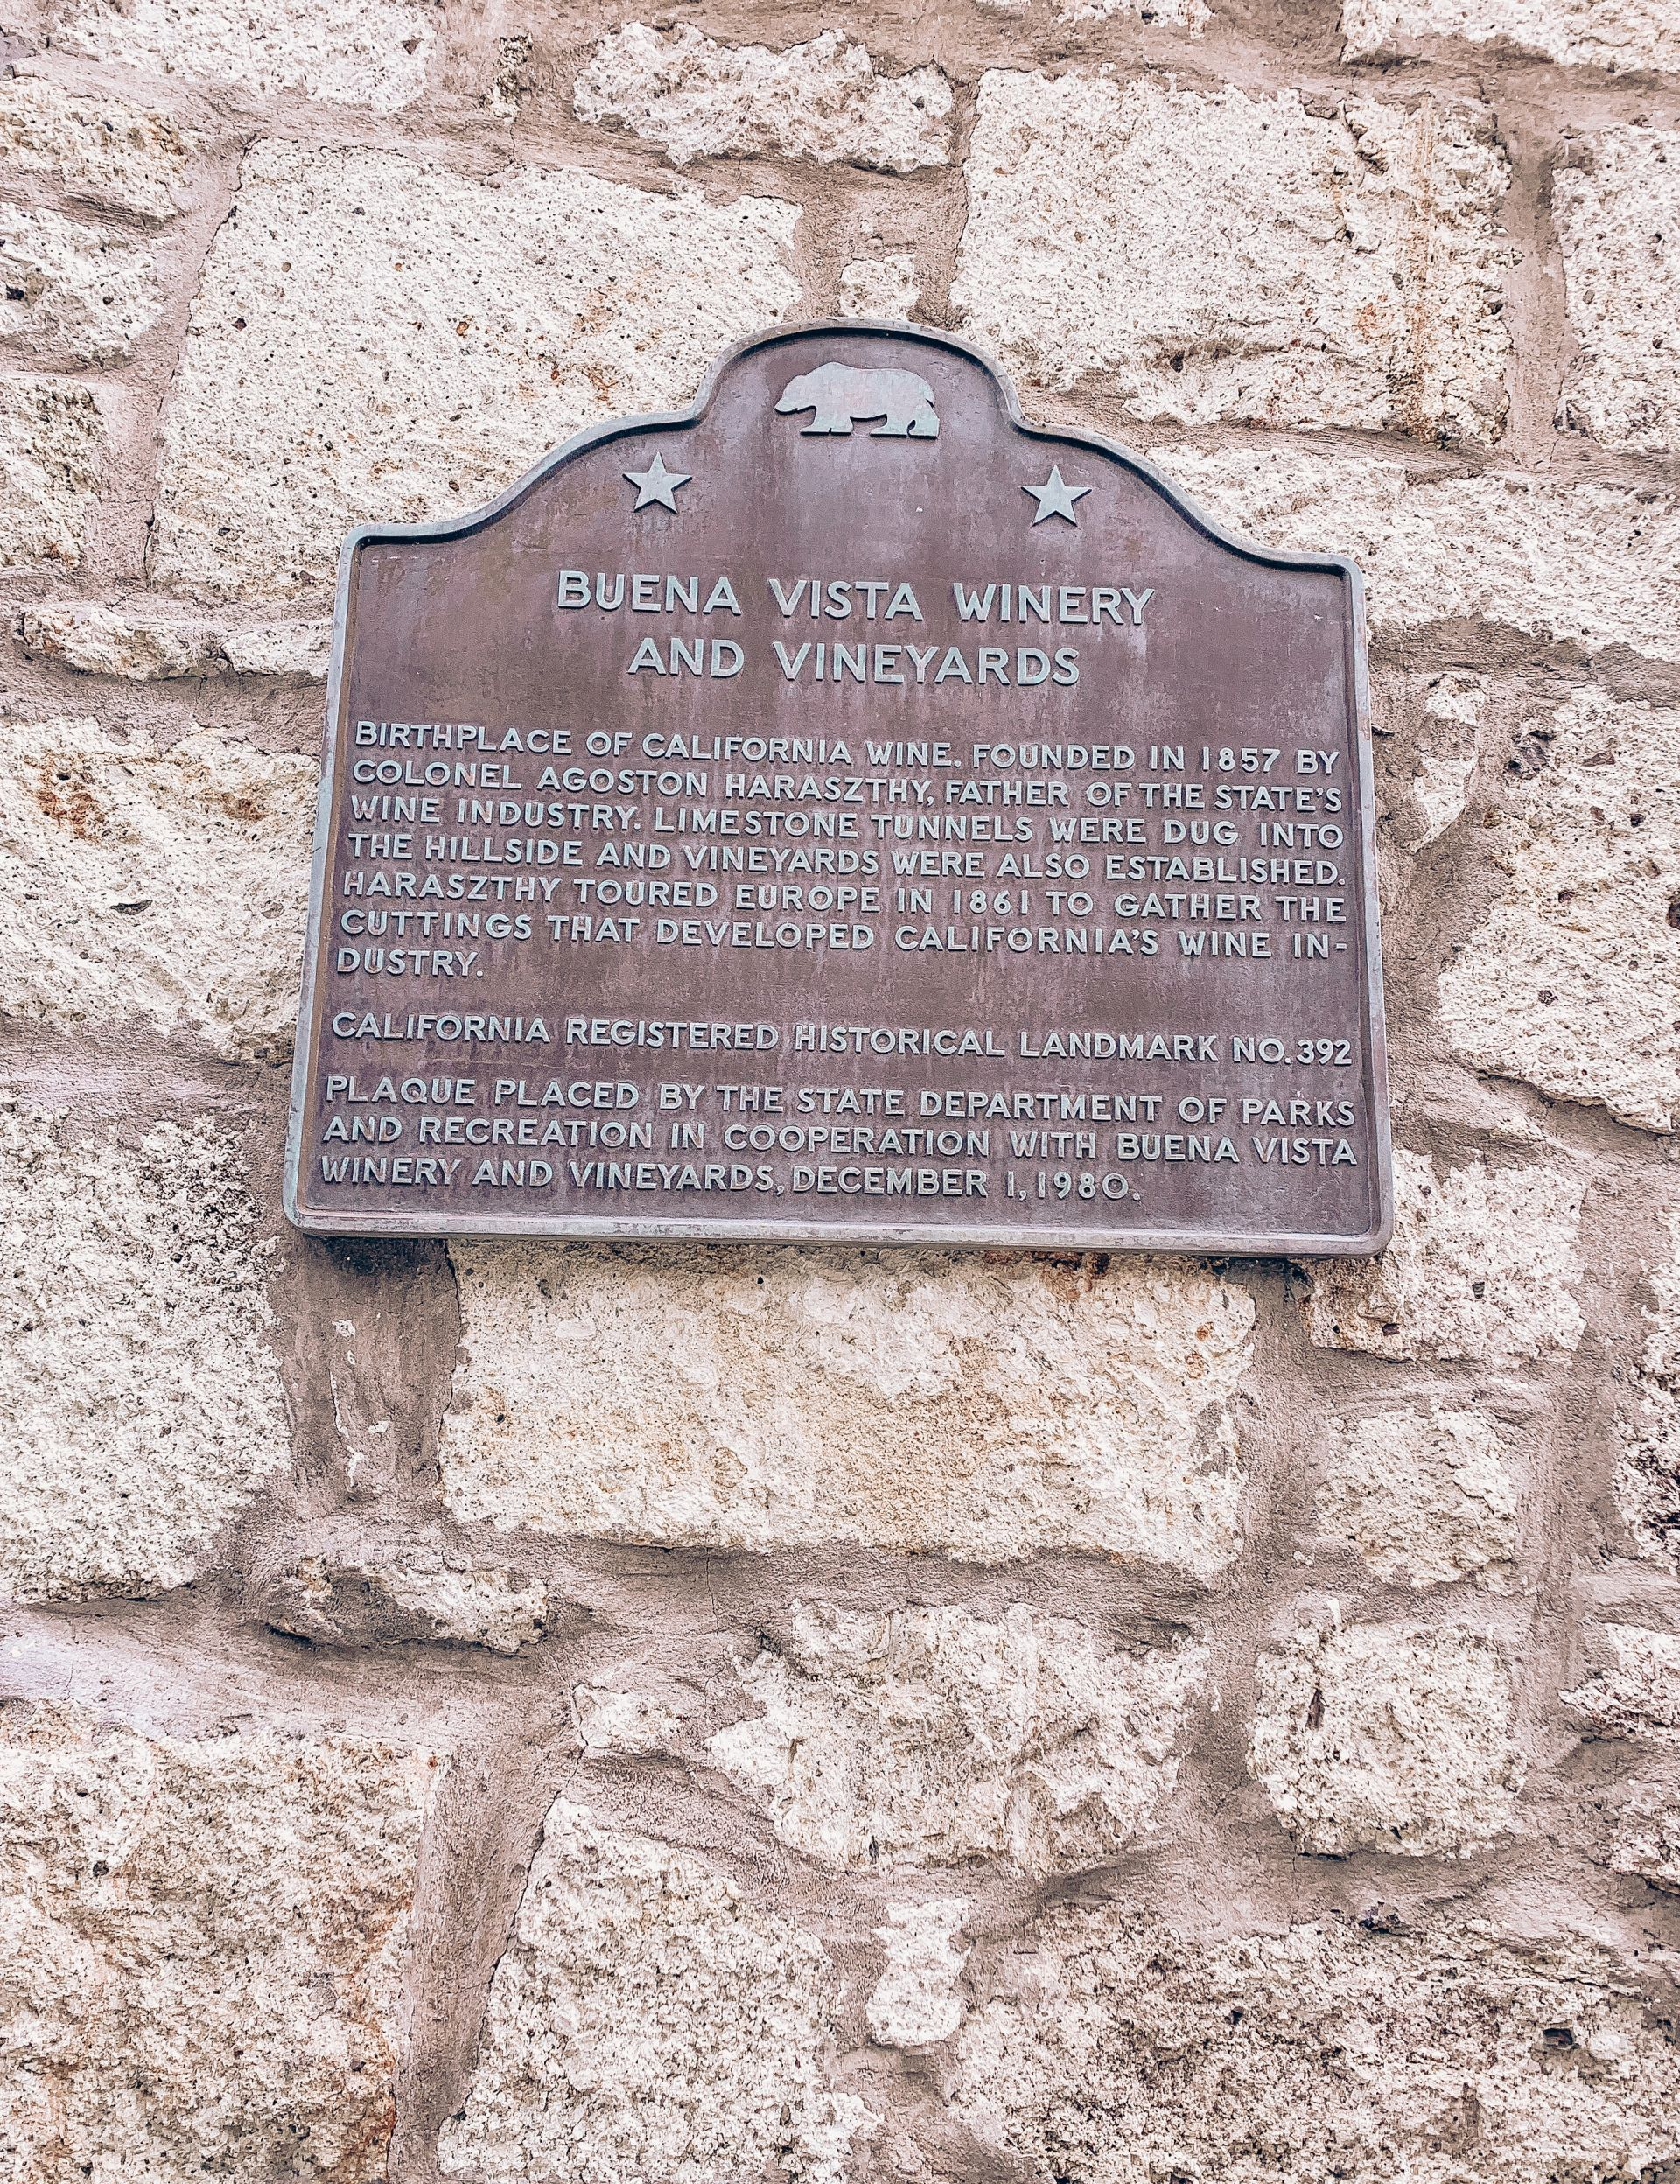 Buena Vista Winery and Vineyards